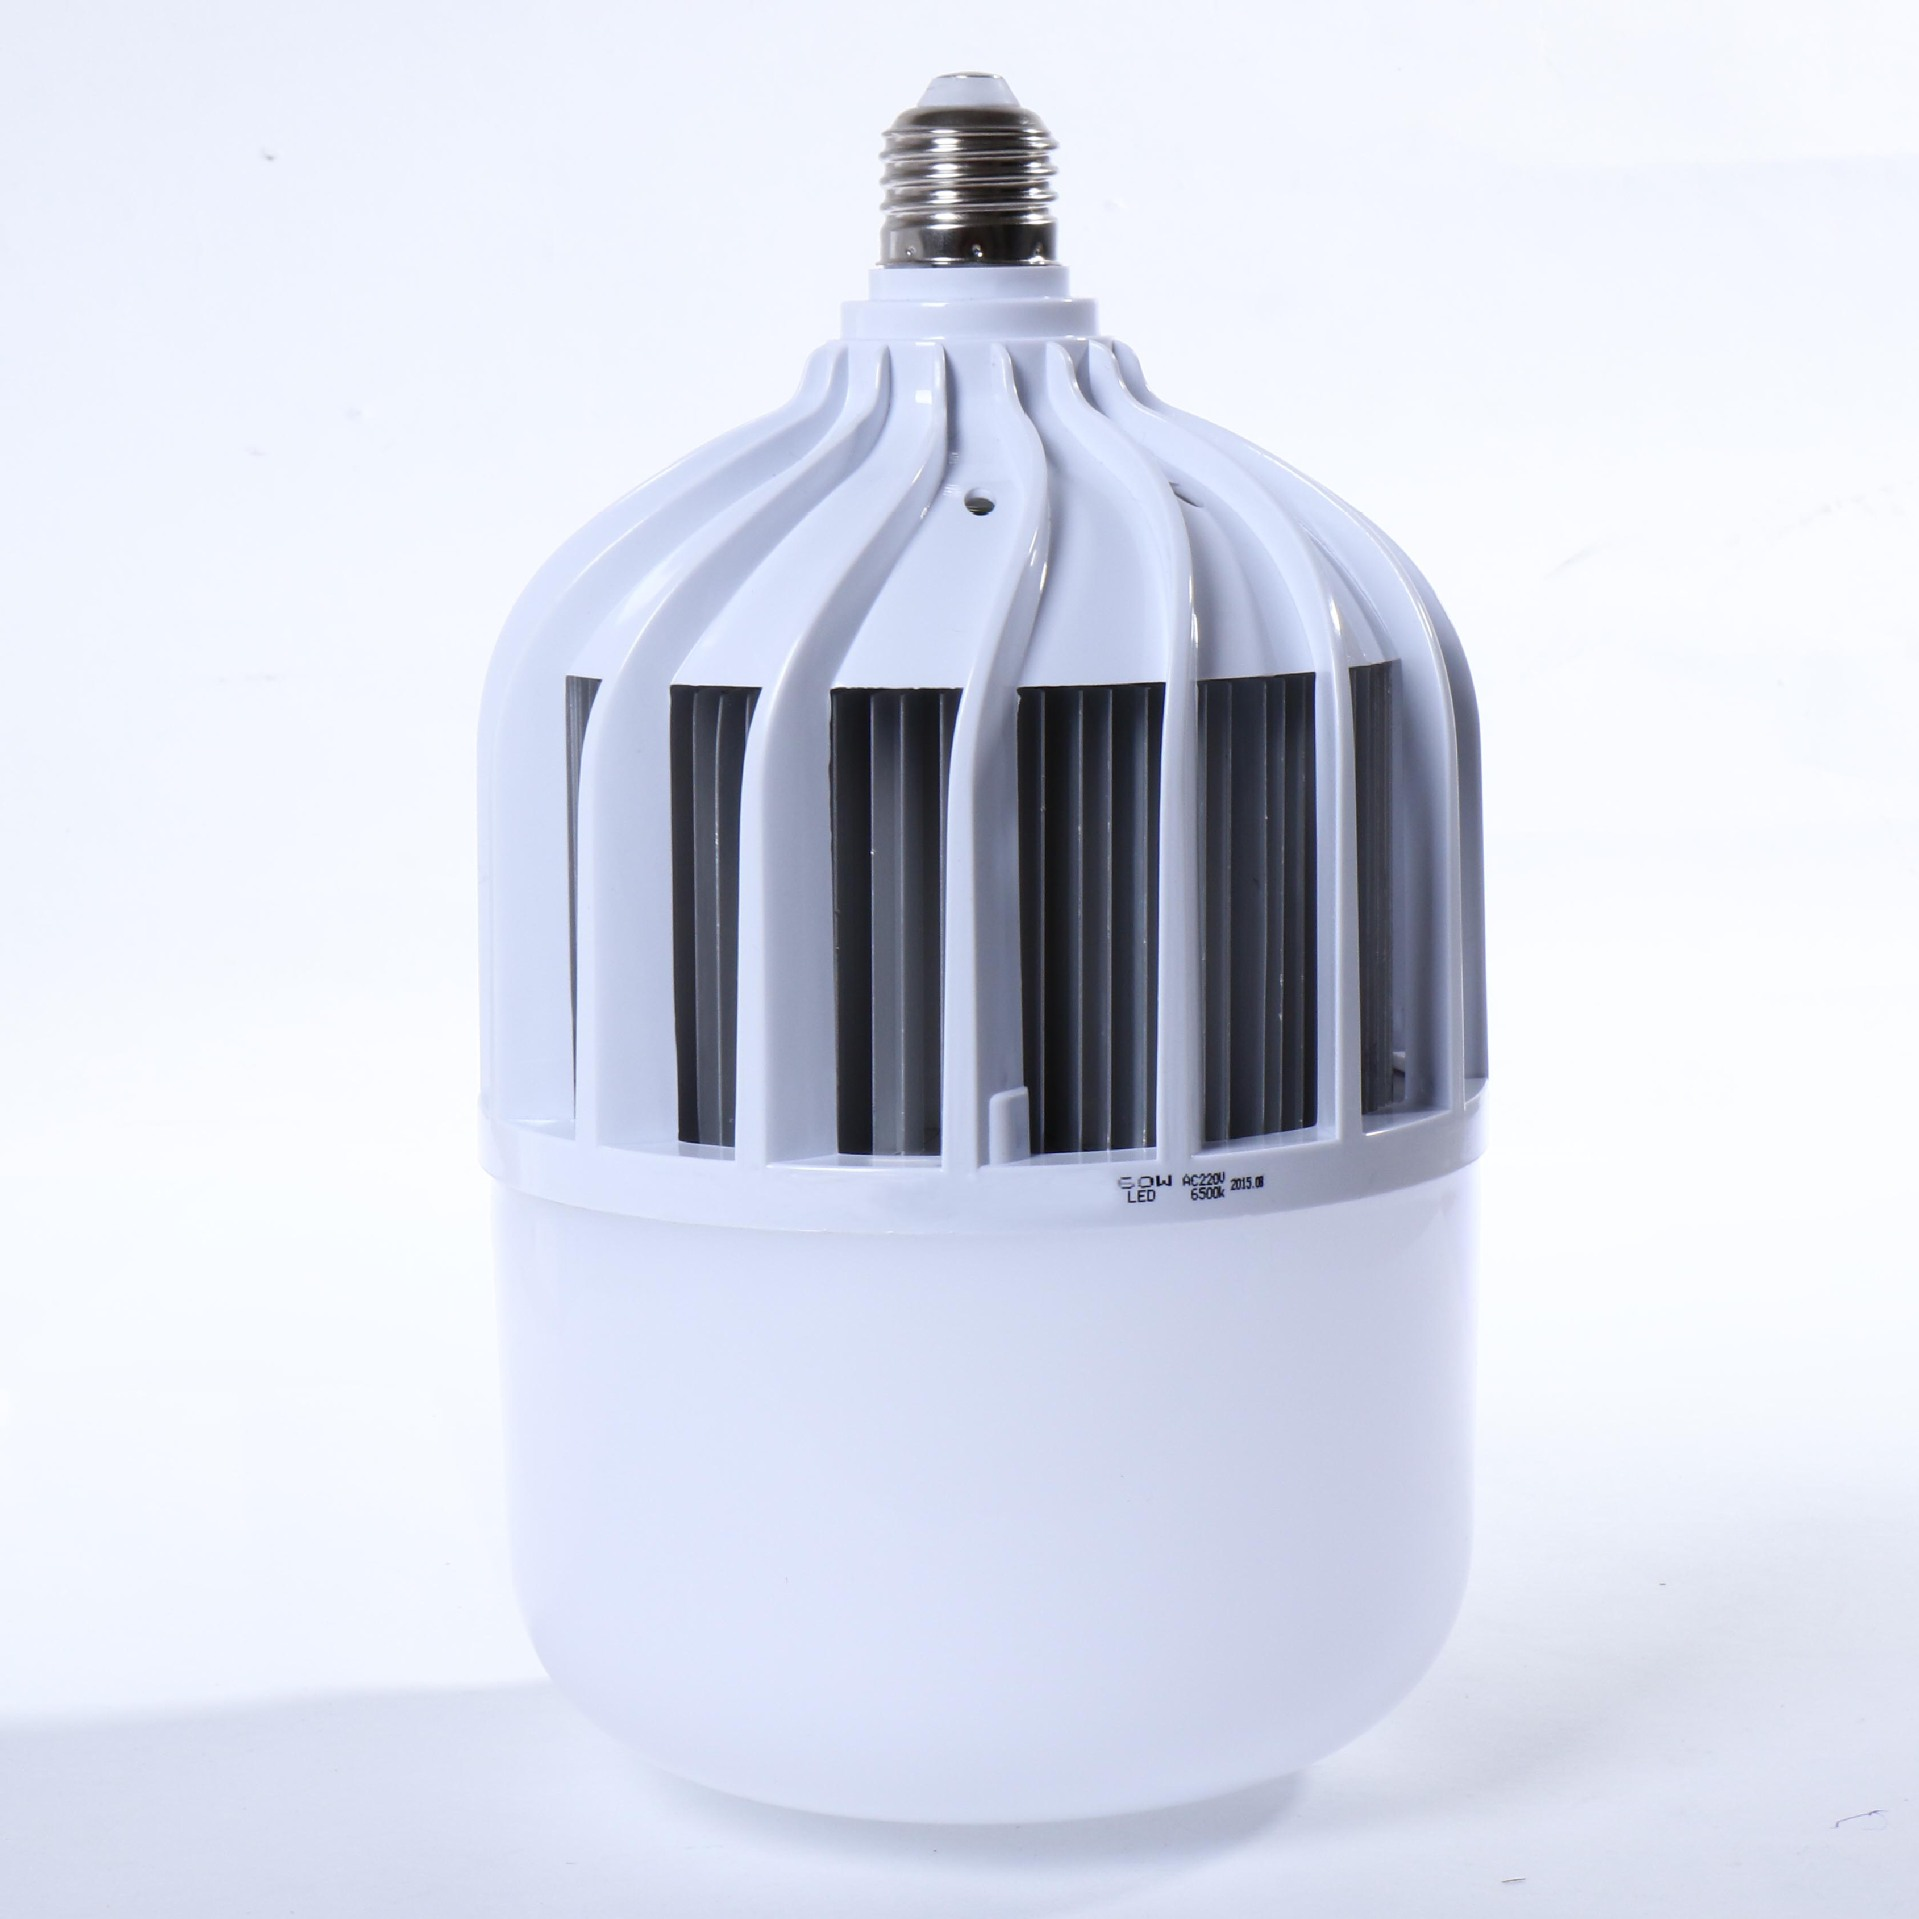 MRDENG-High-power-font-b-LED-b-font-lighting-font-b-manufacturers-b-font-selling-cage Spannende High Power Led E27 Dekorationen